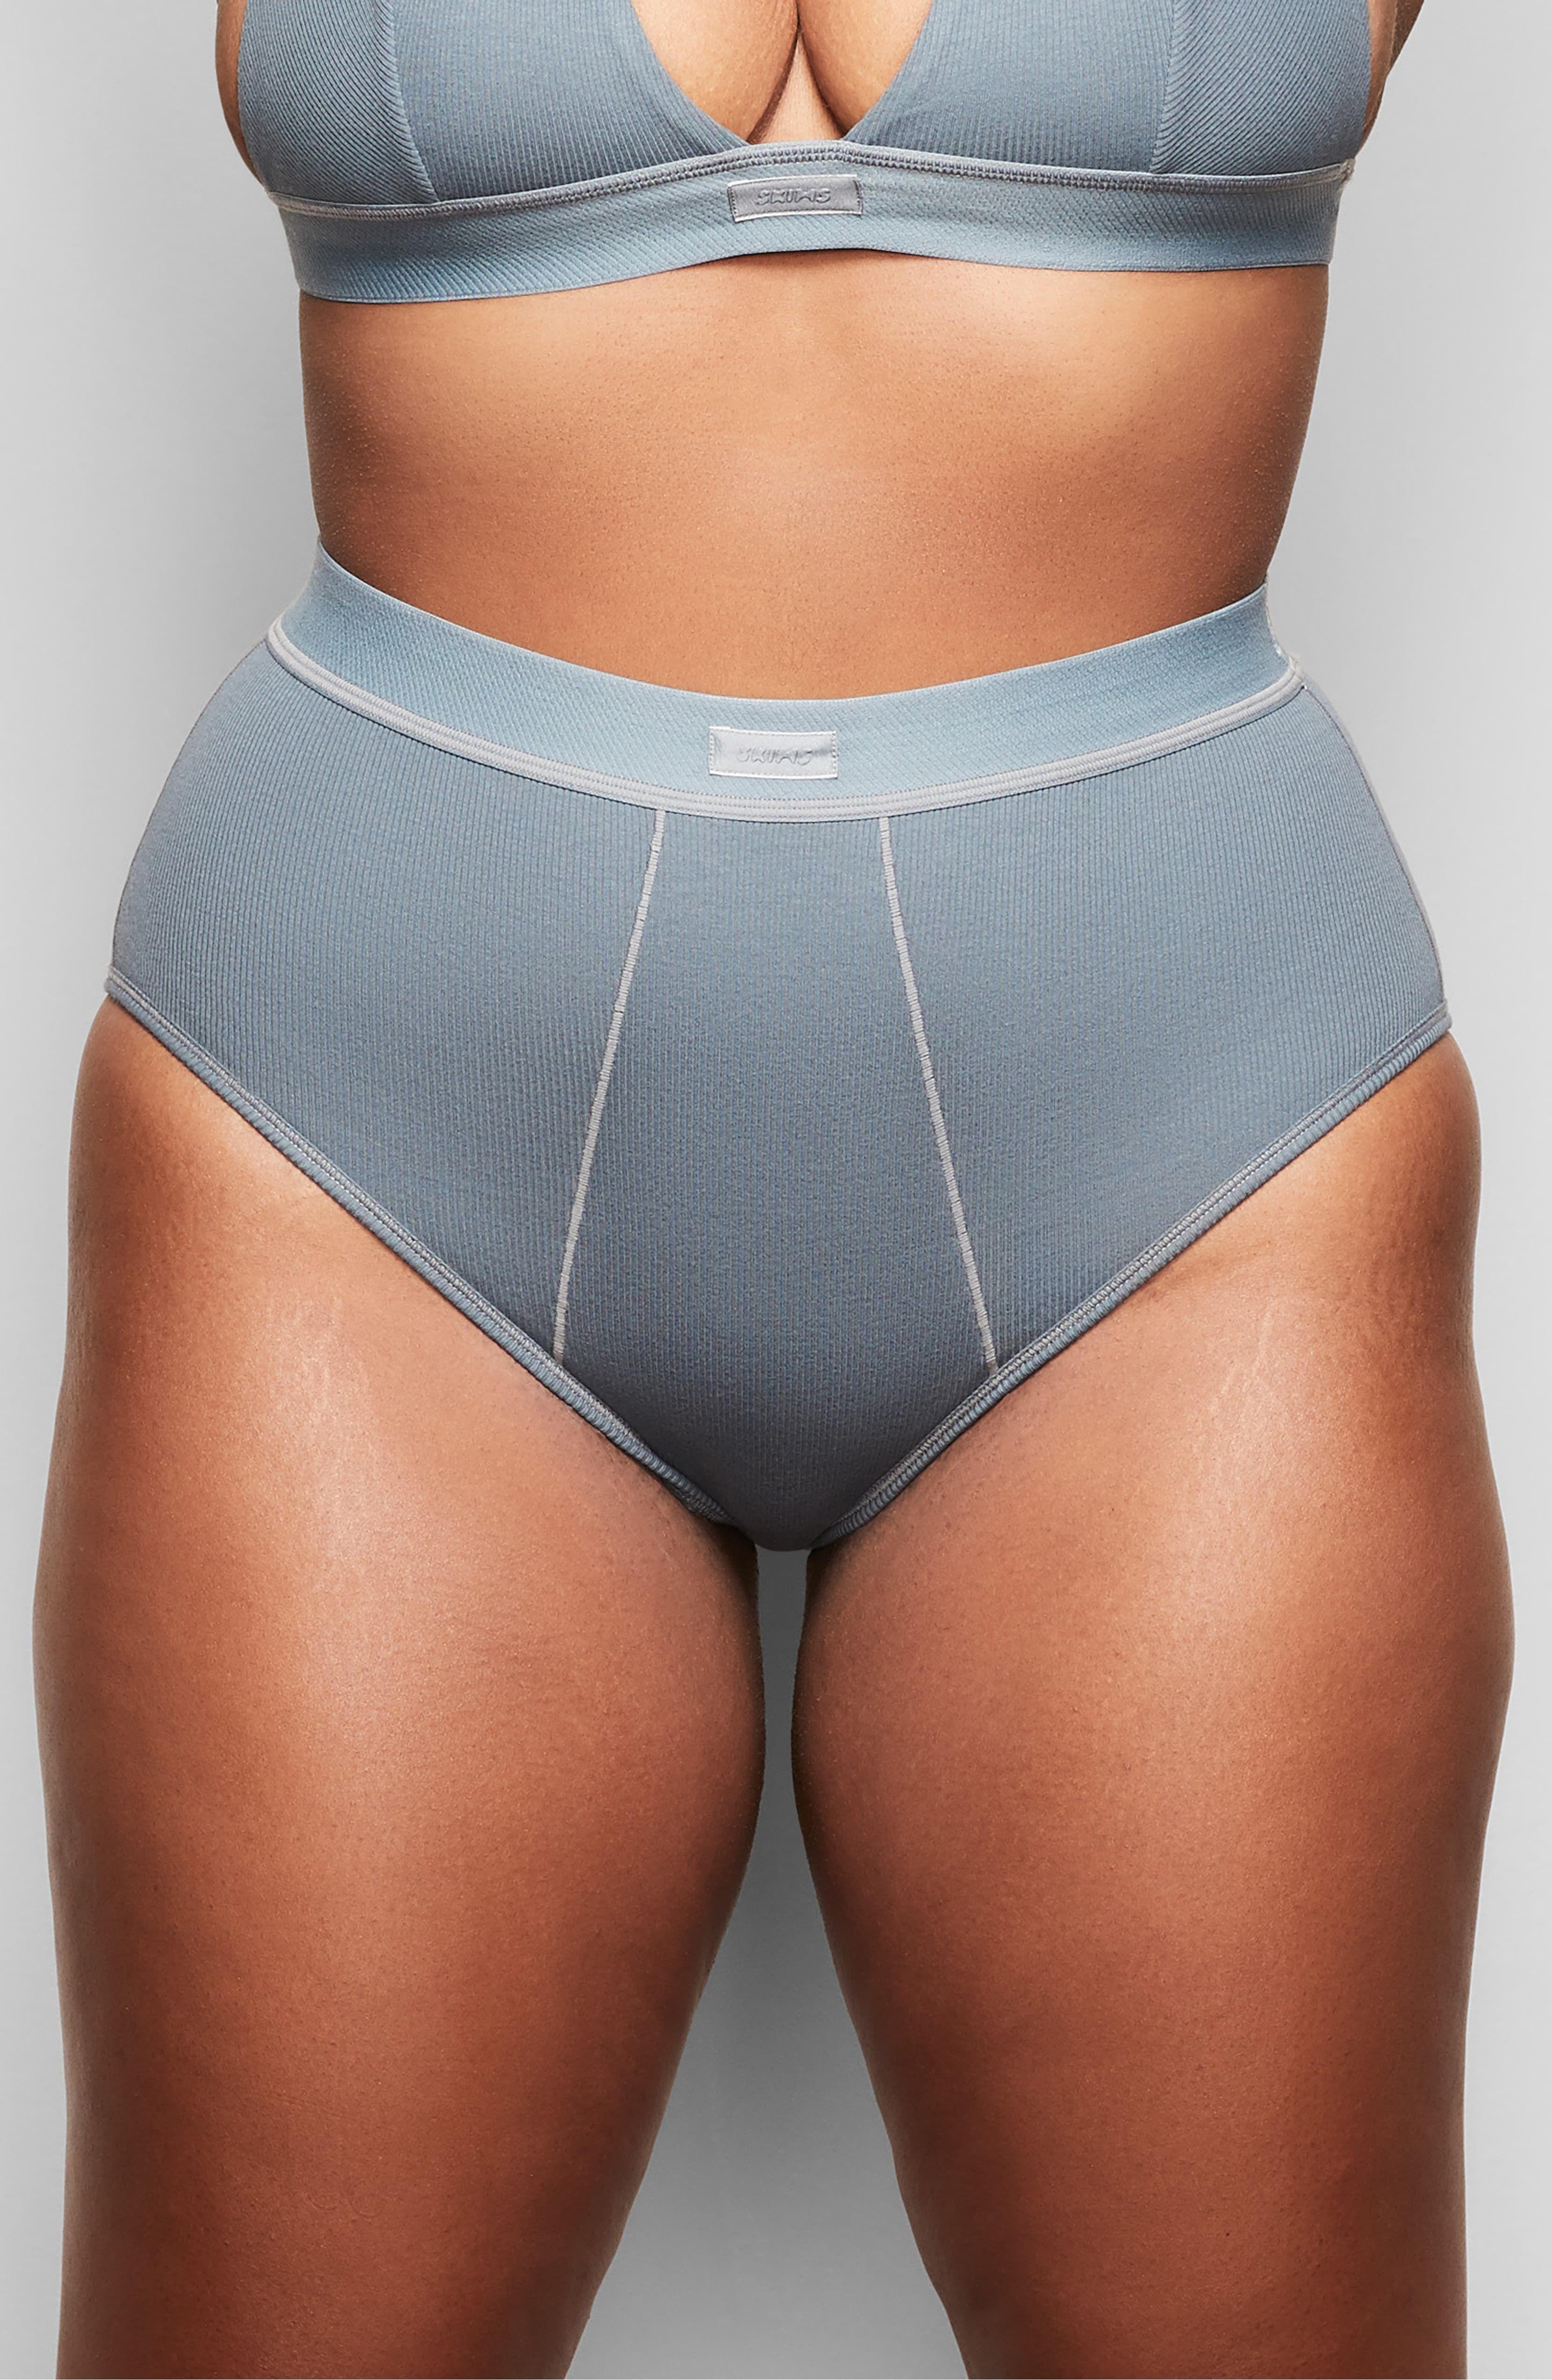 26 Best Underwear Brands For Women 2021 Where To Buy Best Panties For Women